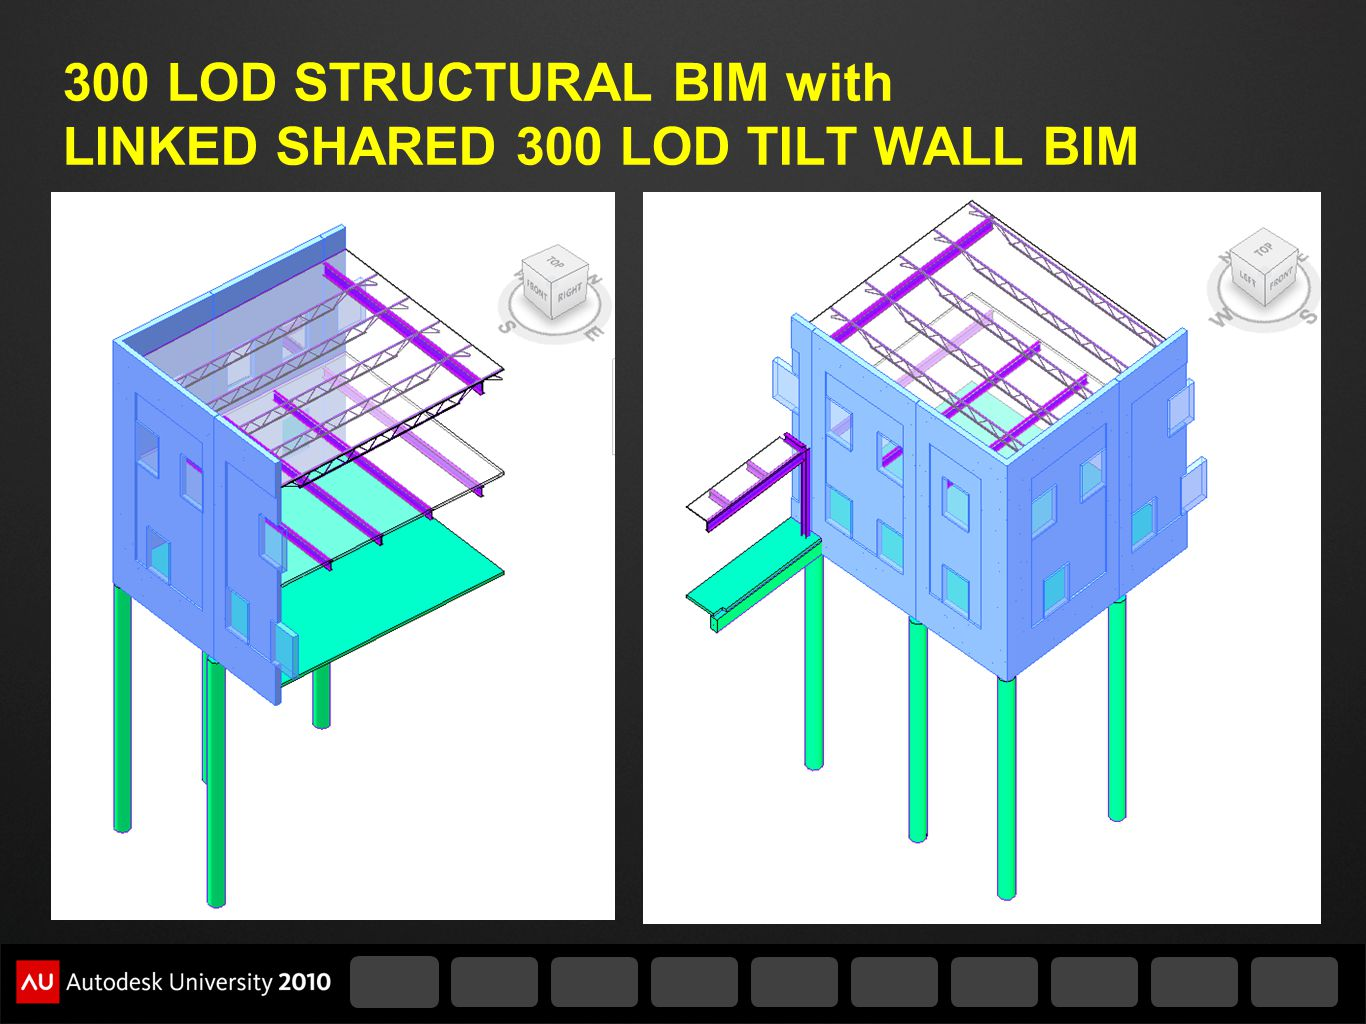 300 LOD STRUCTURAL BIM with LINKED SHARED 300 LOD TILT WALL BIM